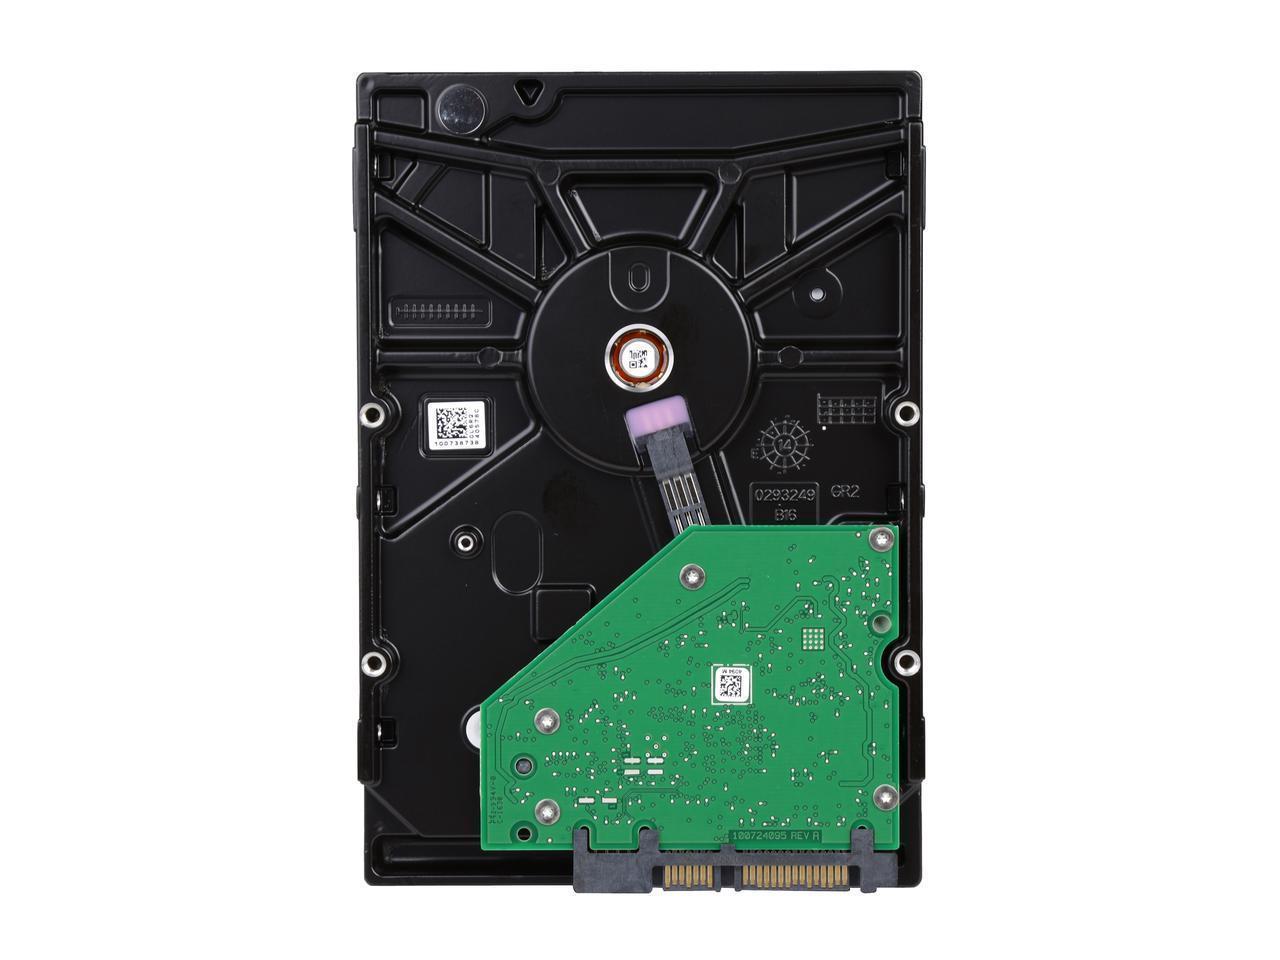 Хард диск SEAGATE SkyHawk ST2000VX008, 2TB, 64MB Cache, SATA 6.0Gb/s-3